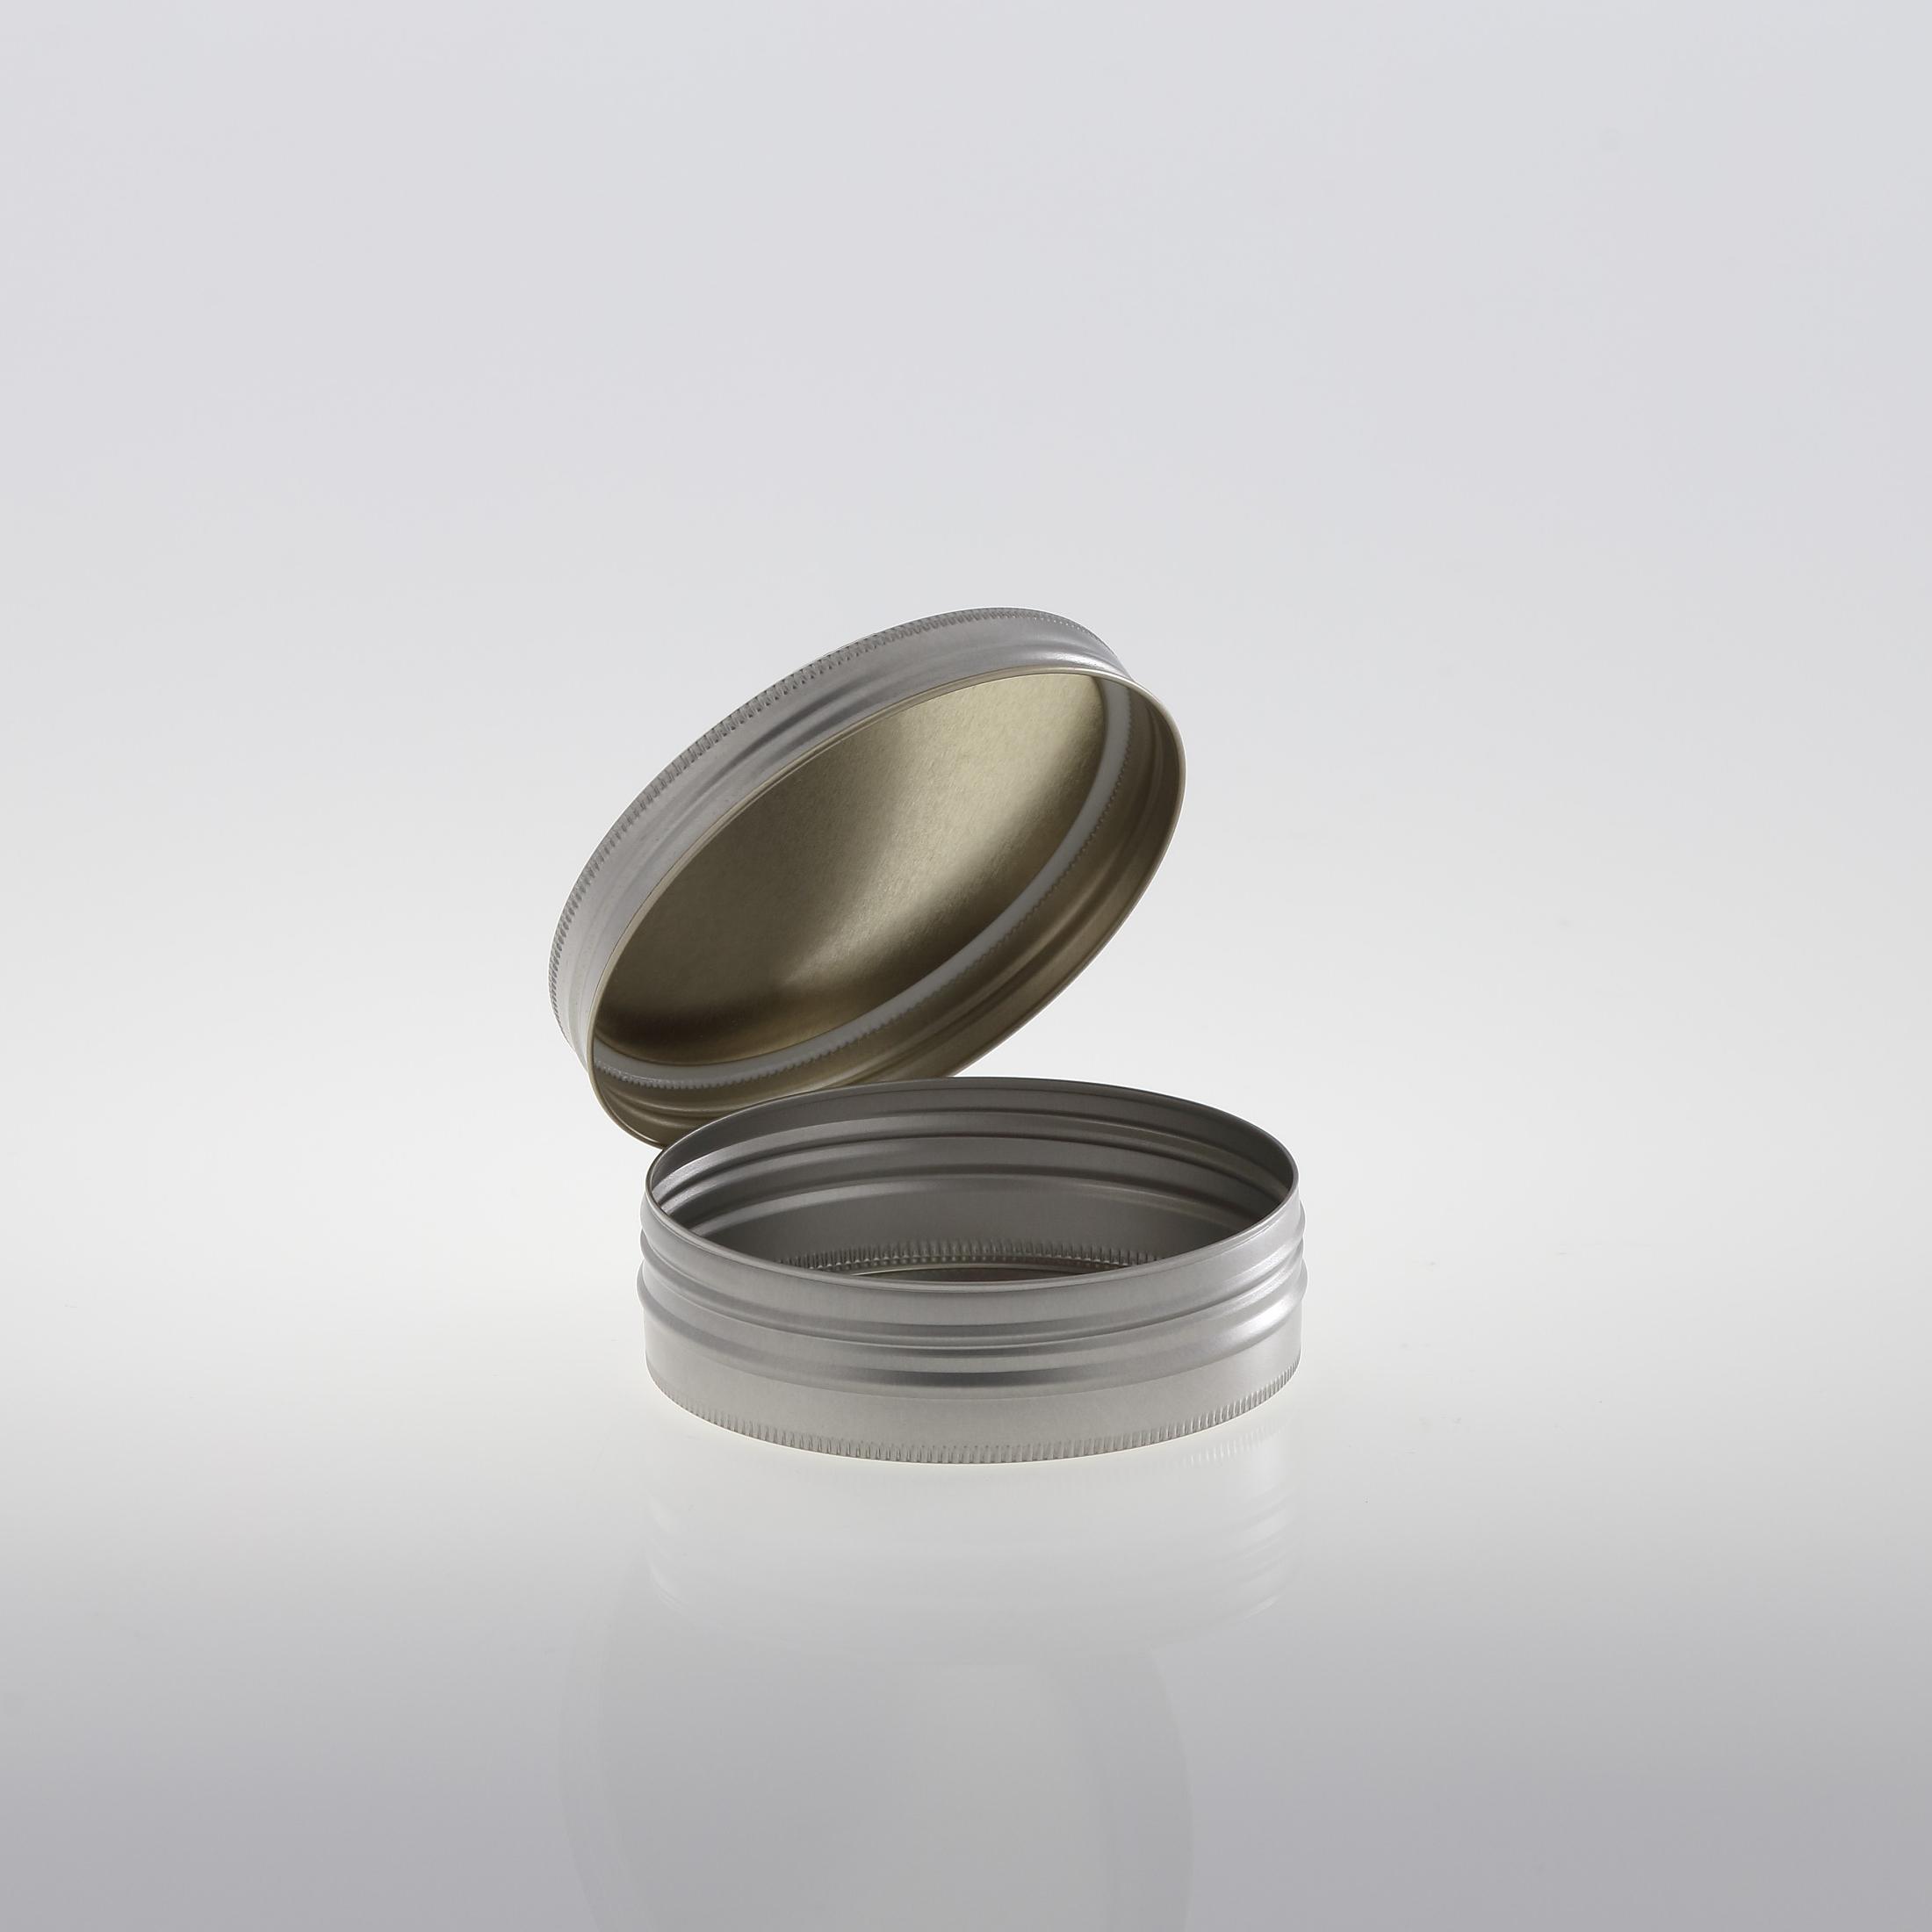 Schraubdeckeldosen 76/23 100 ml